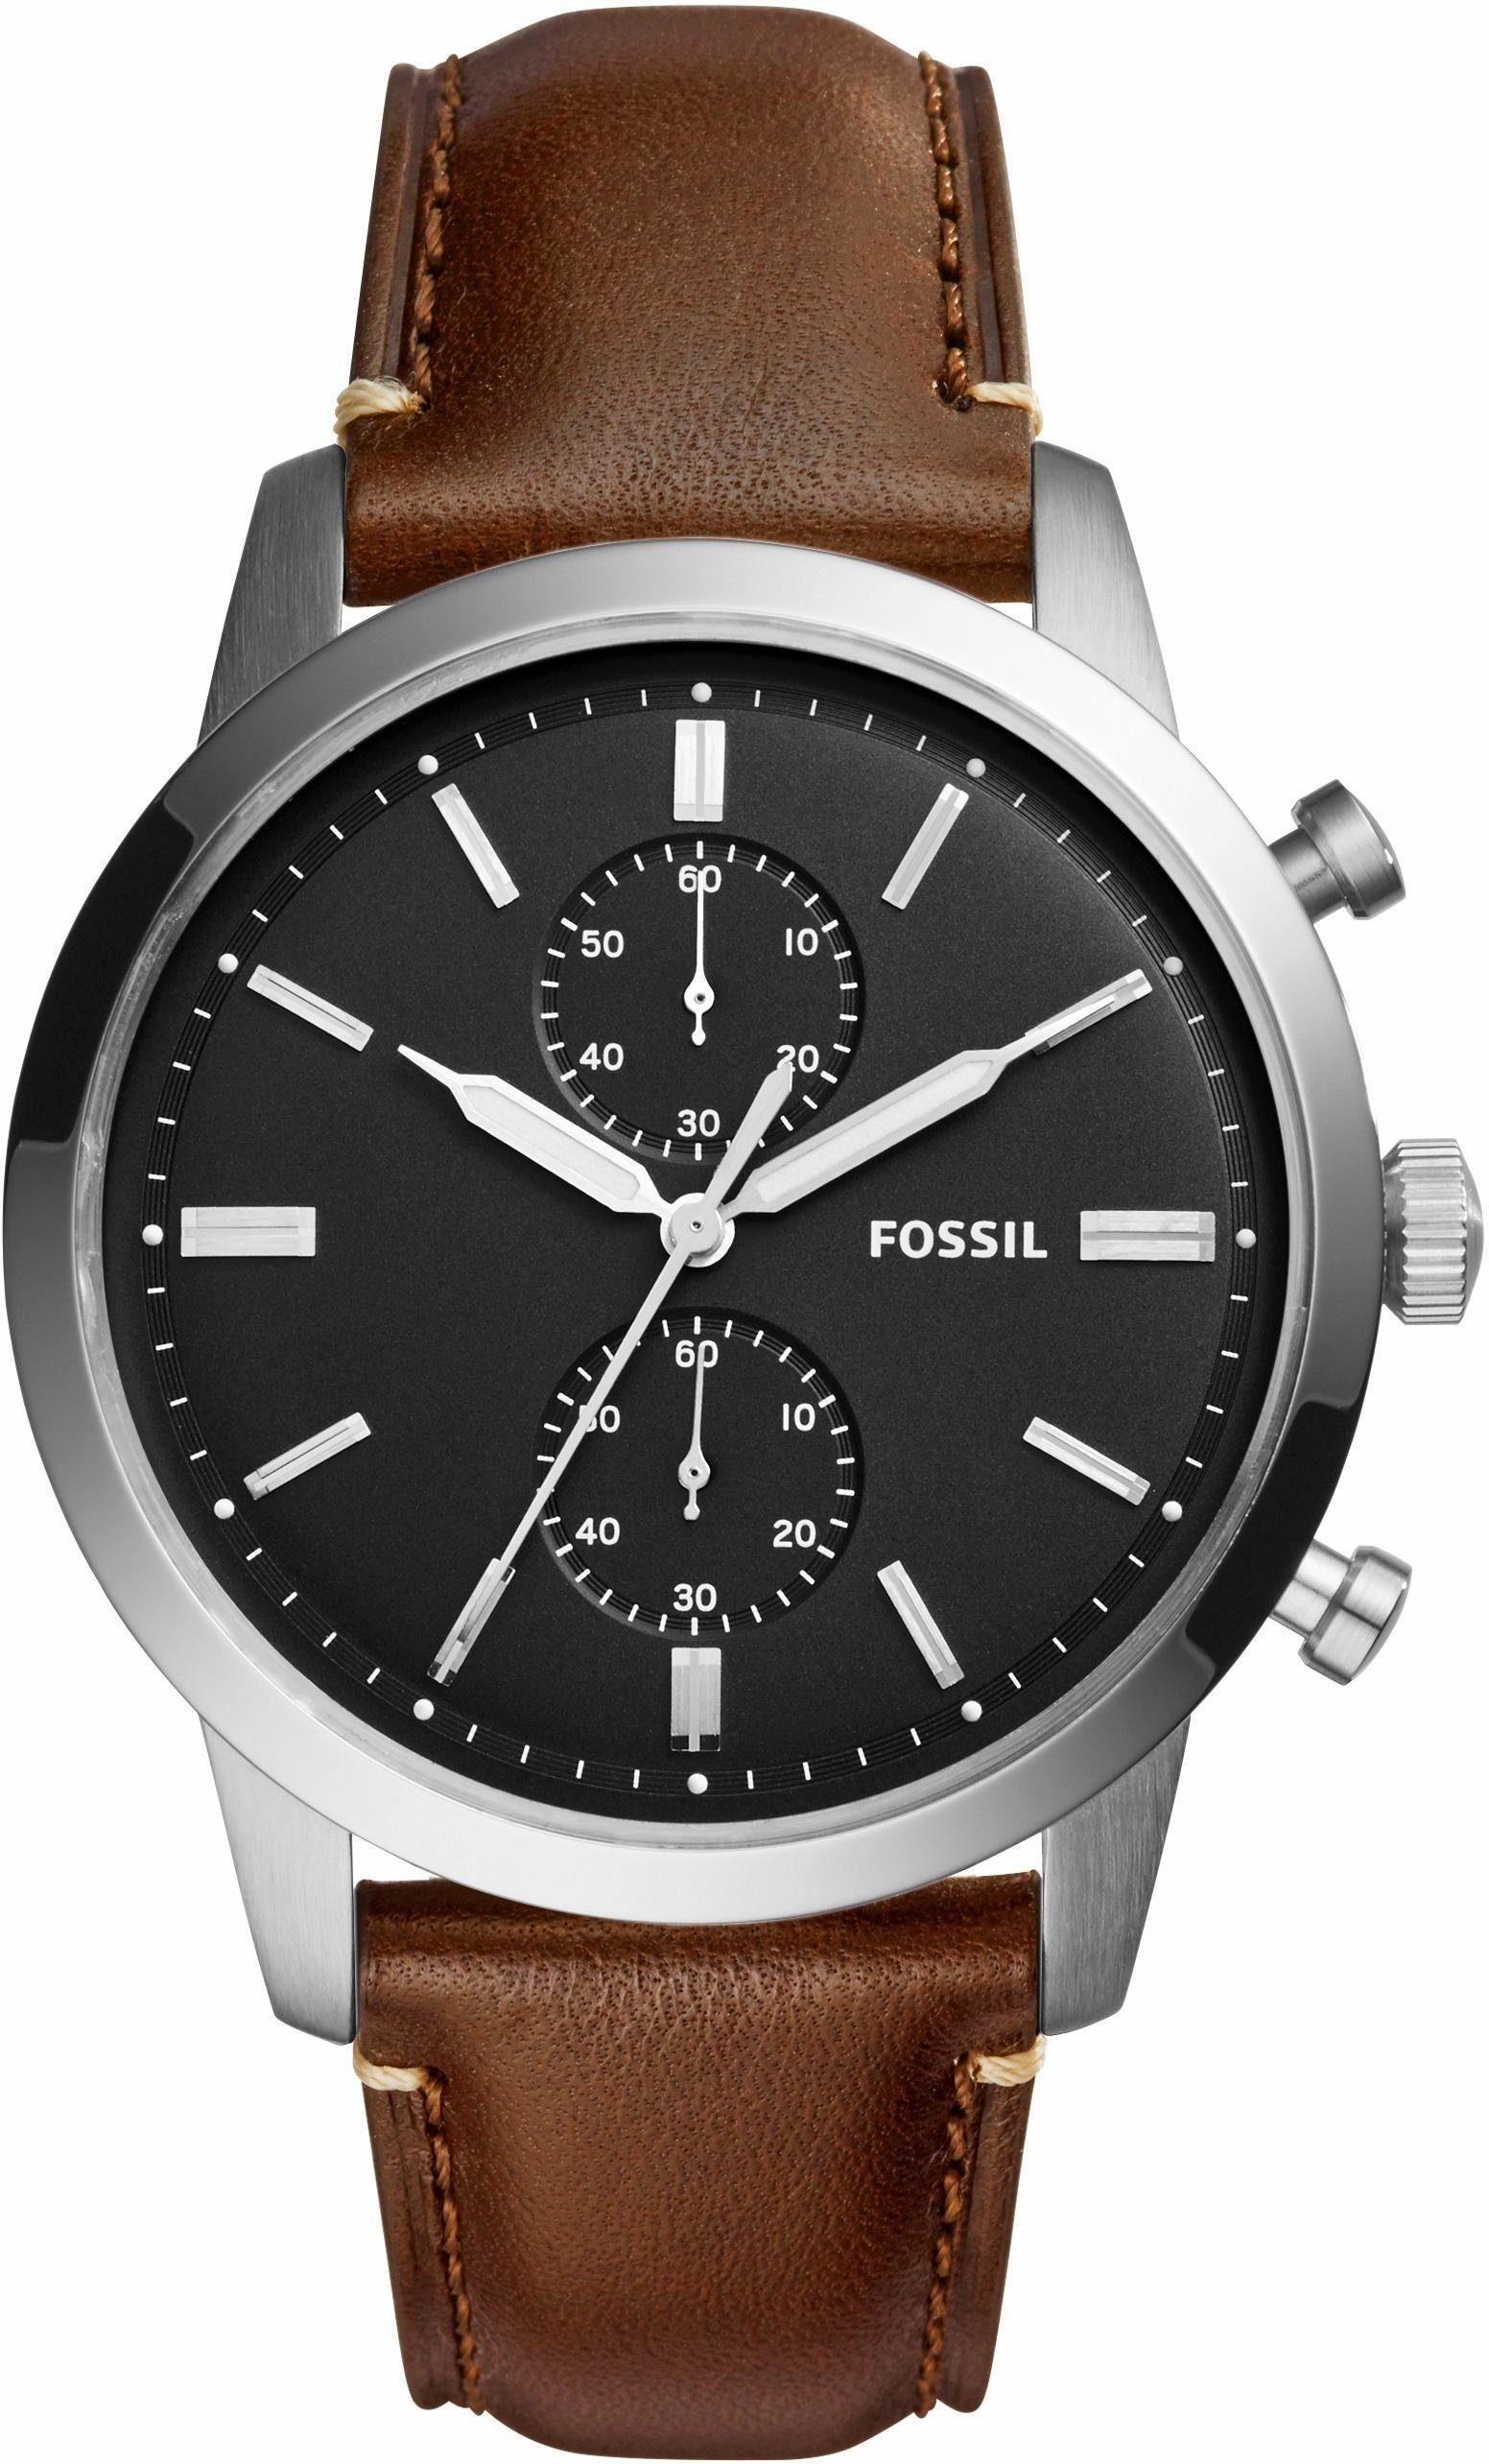 Fossil Chronograph »TOWNSMAN, FS5280«